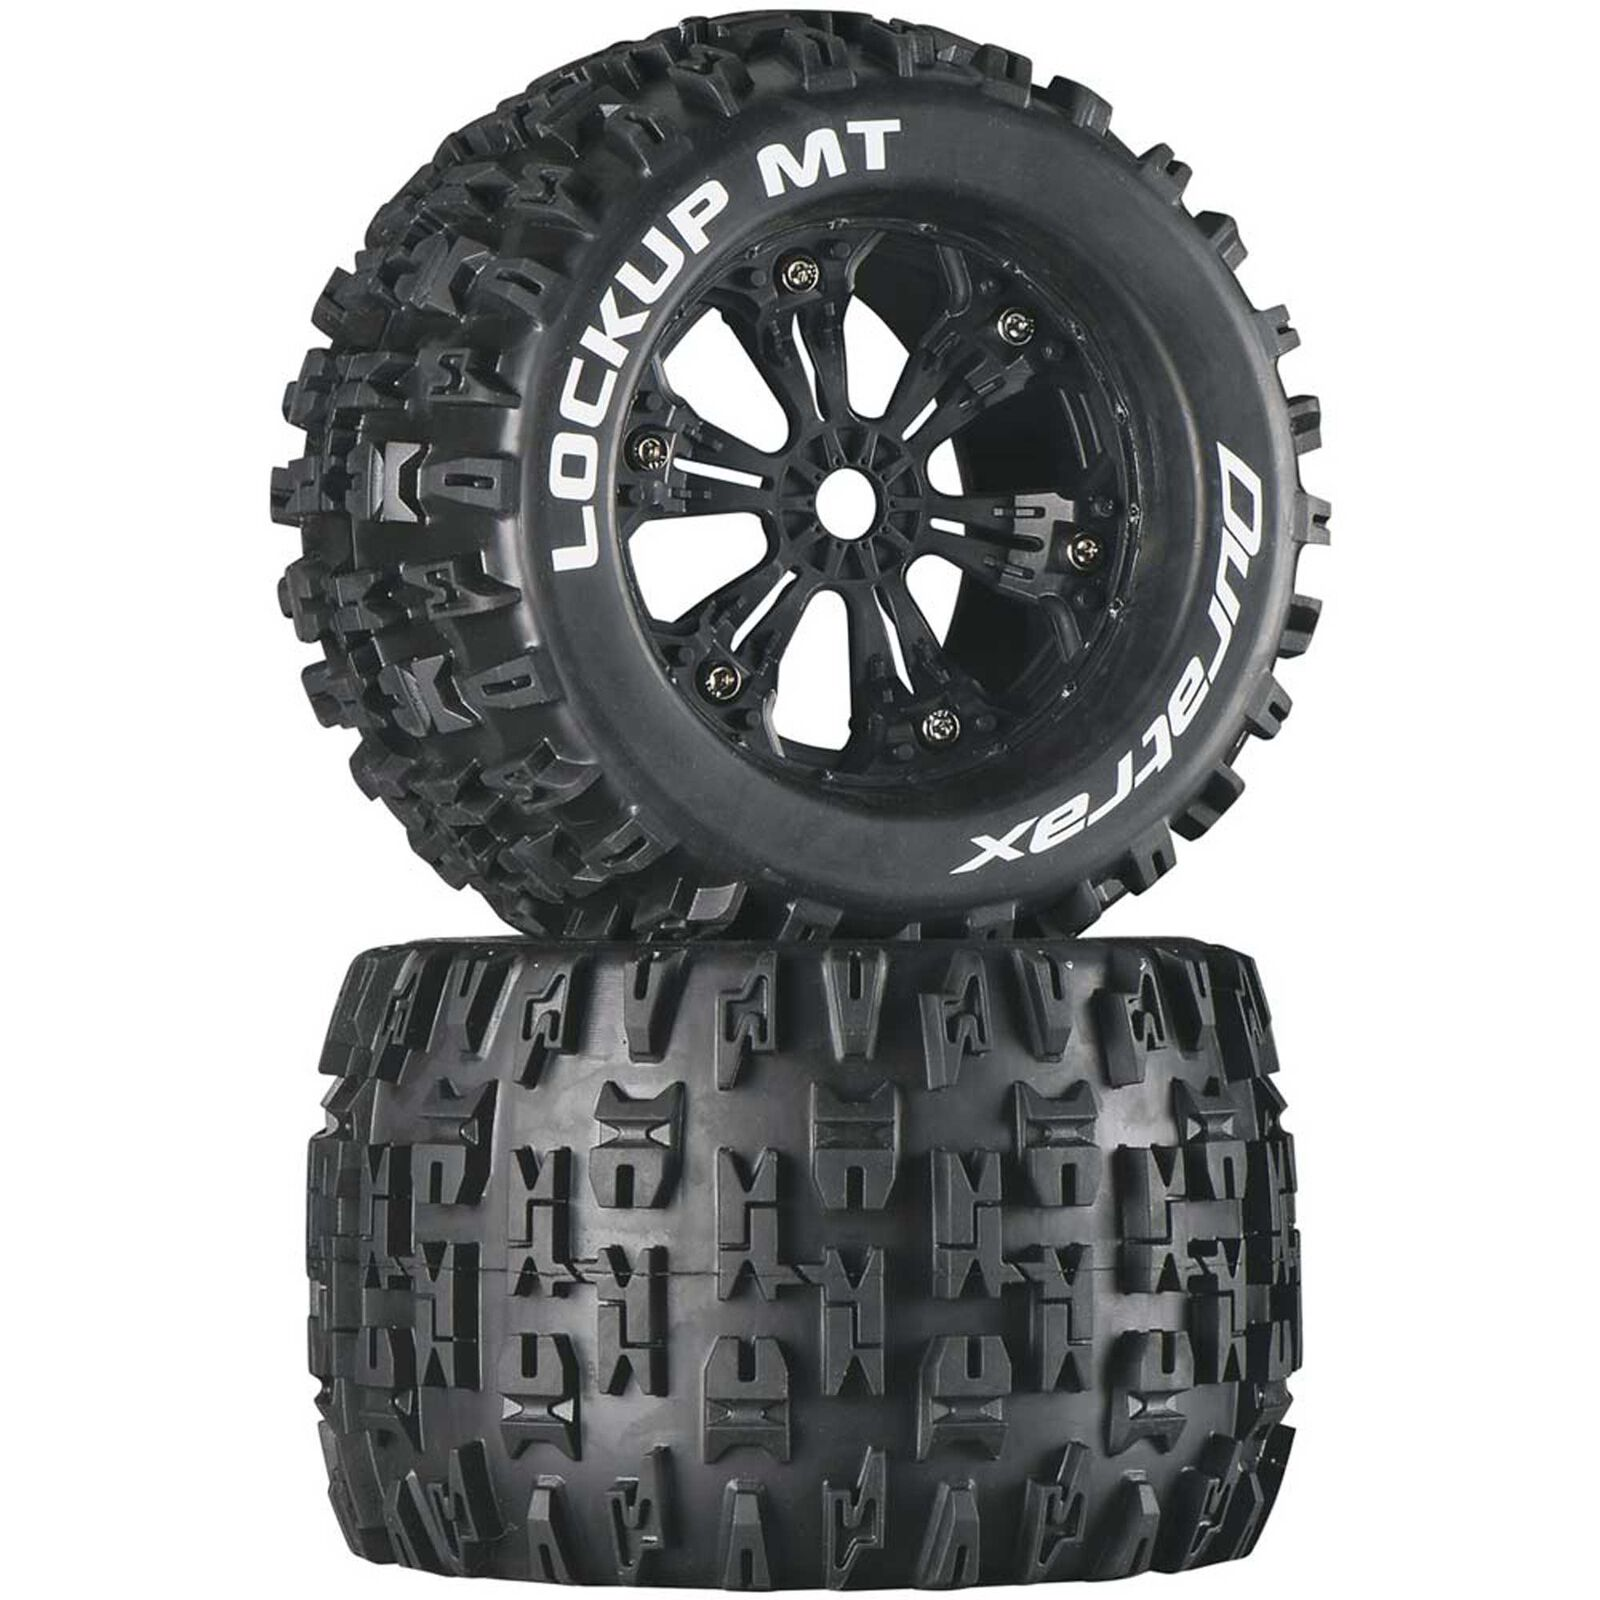 "Lockup MT 3.8"" Mounted Tires, Black (2)"